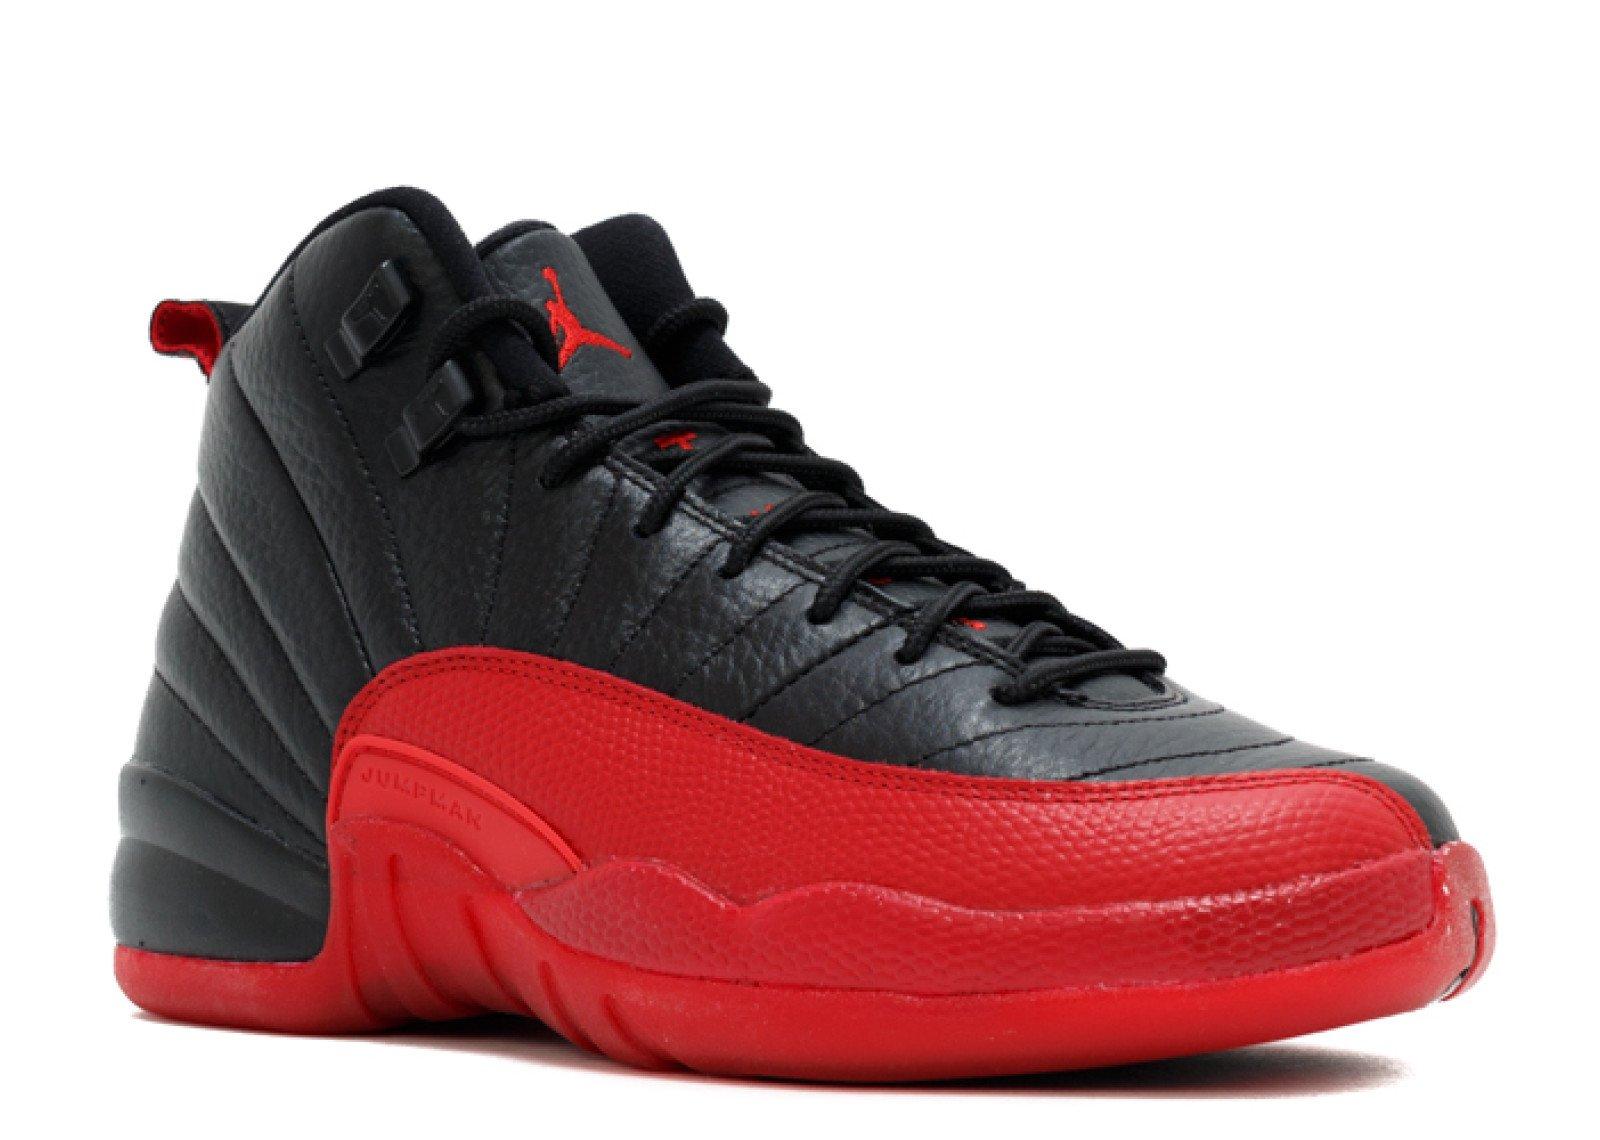 buy online 4d96b 90d38 Galleon - Jordan Boy s 12 Retro Big Kids Style, Black Varsity Red, 5.5